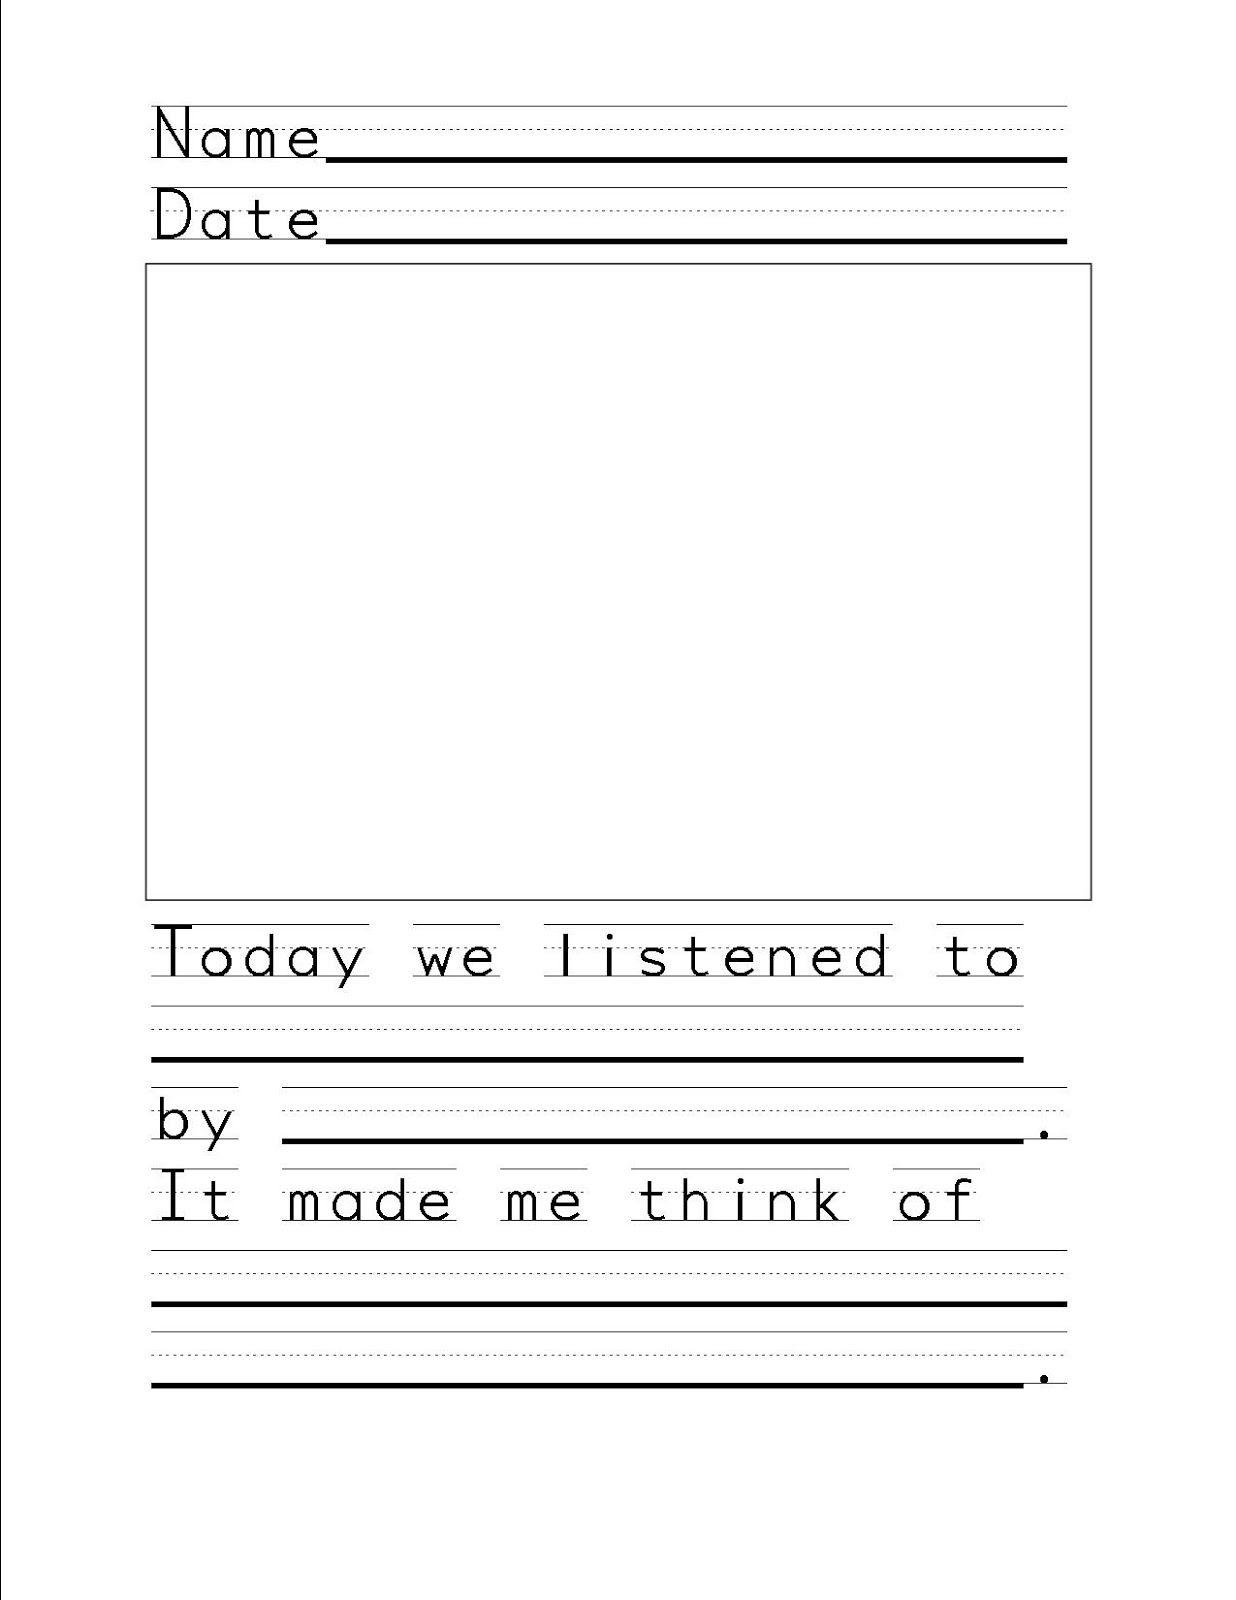 So La Mi Elementary Music Class Listening Response Sheet Music Education